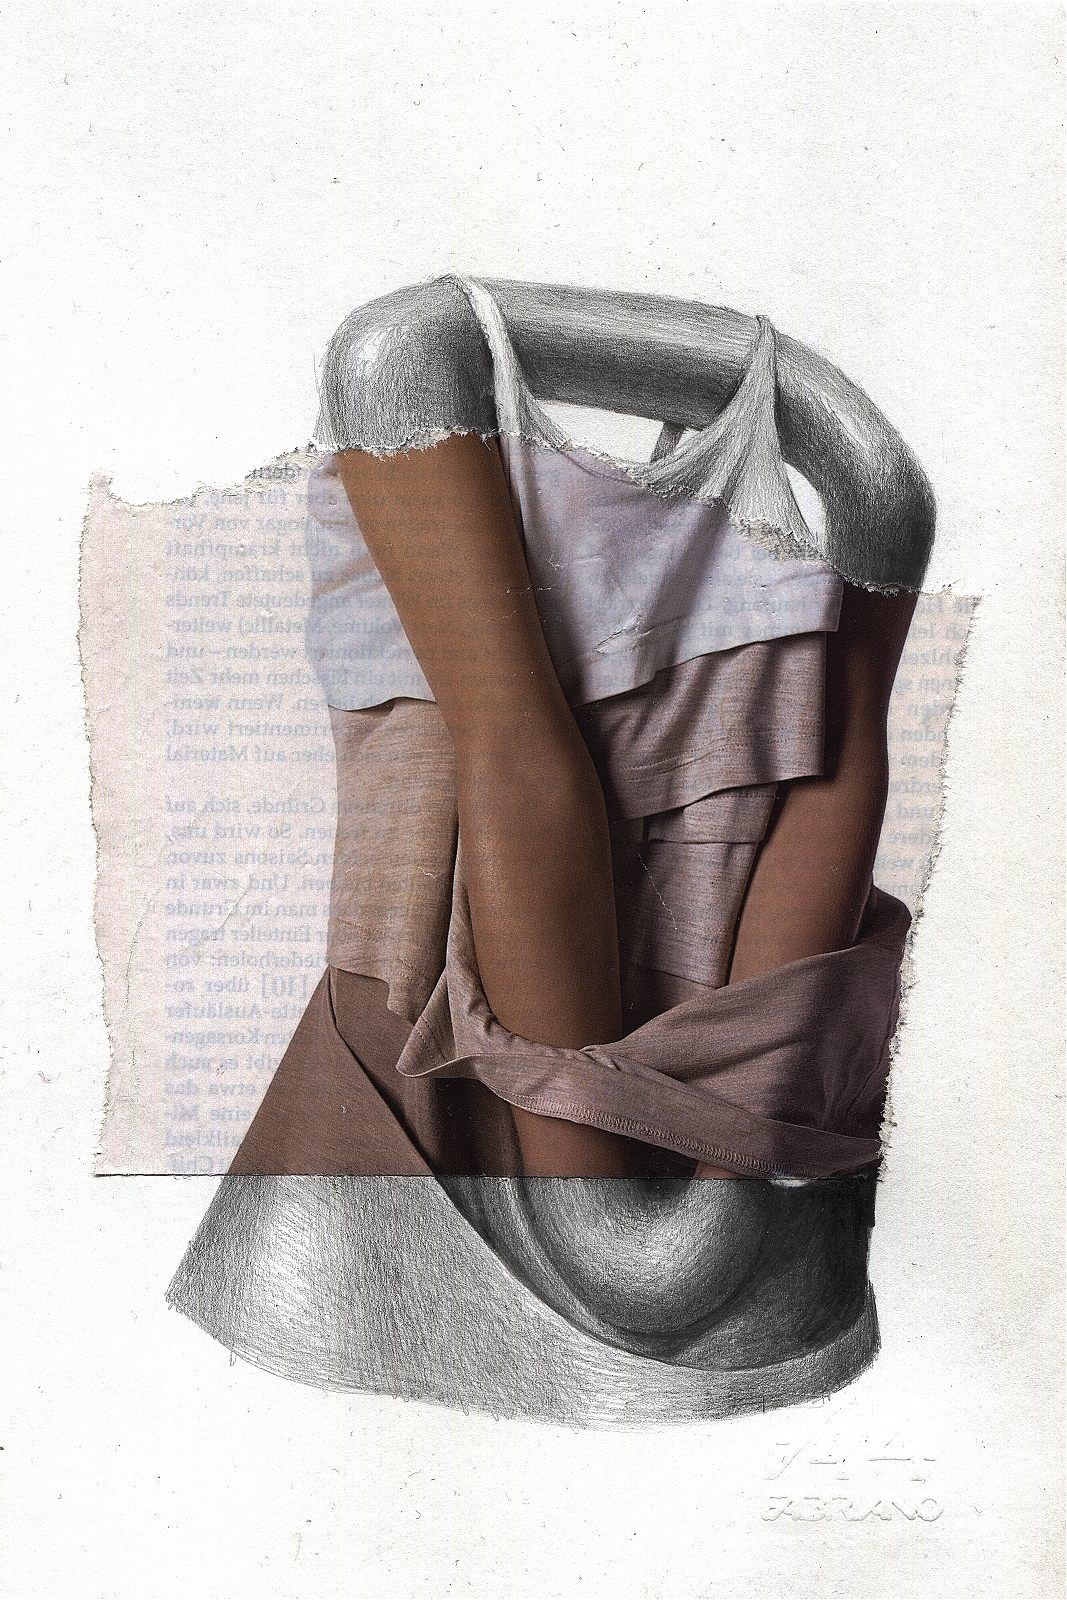 """Gestell"", 2013, pencil, collage, 16.5 x 24 cm"